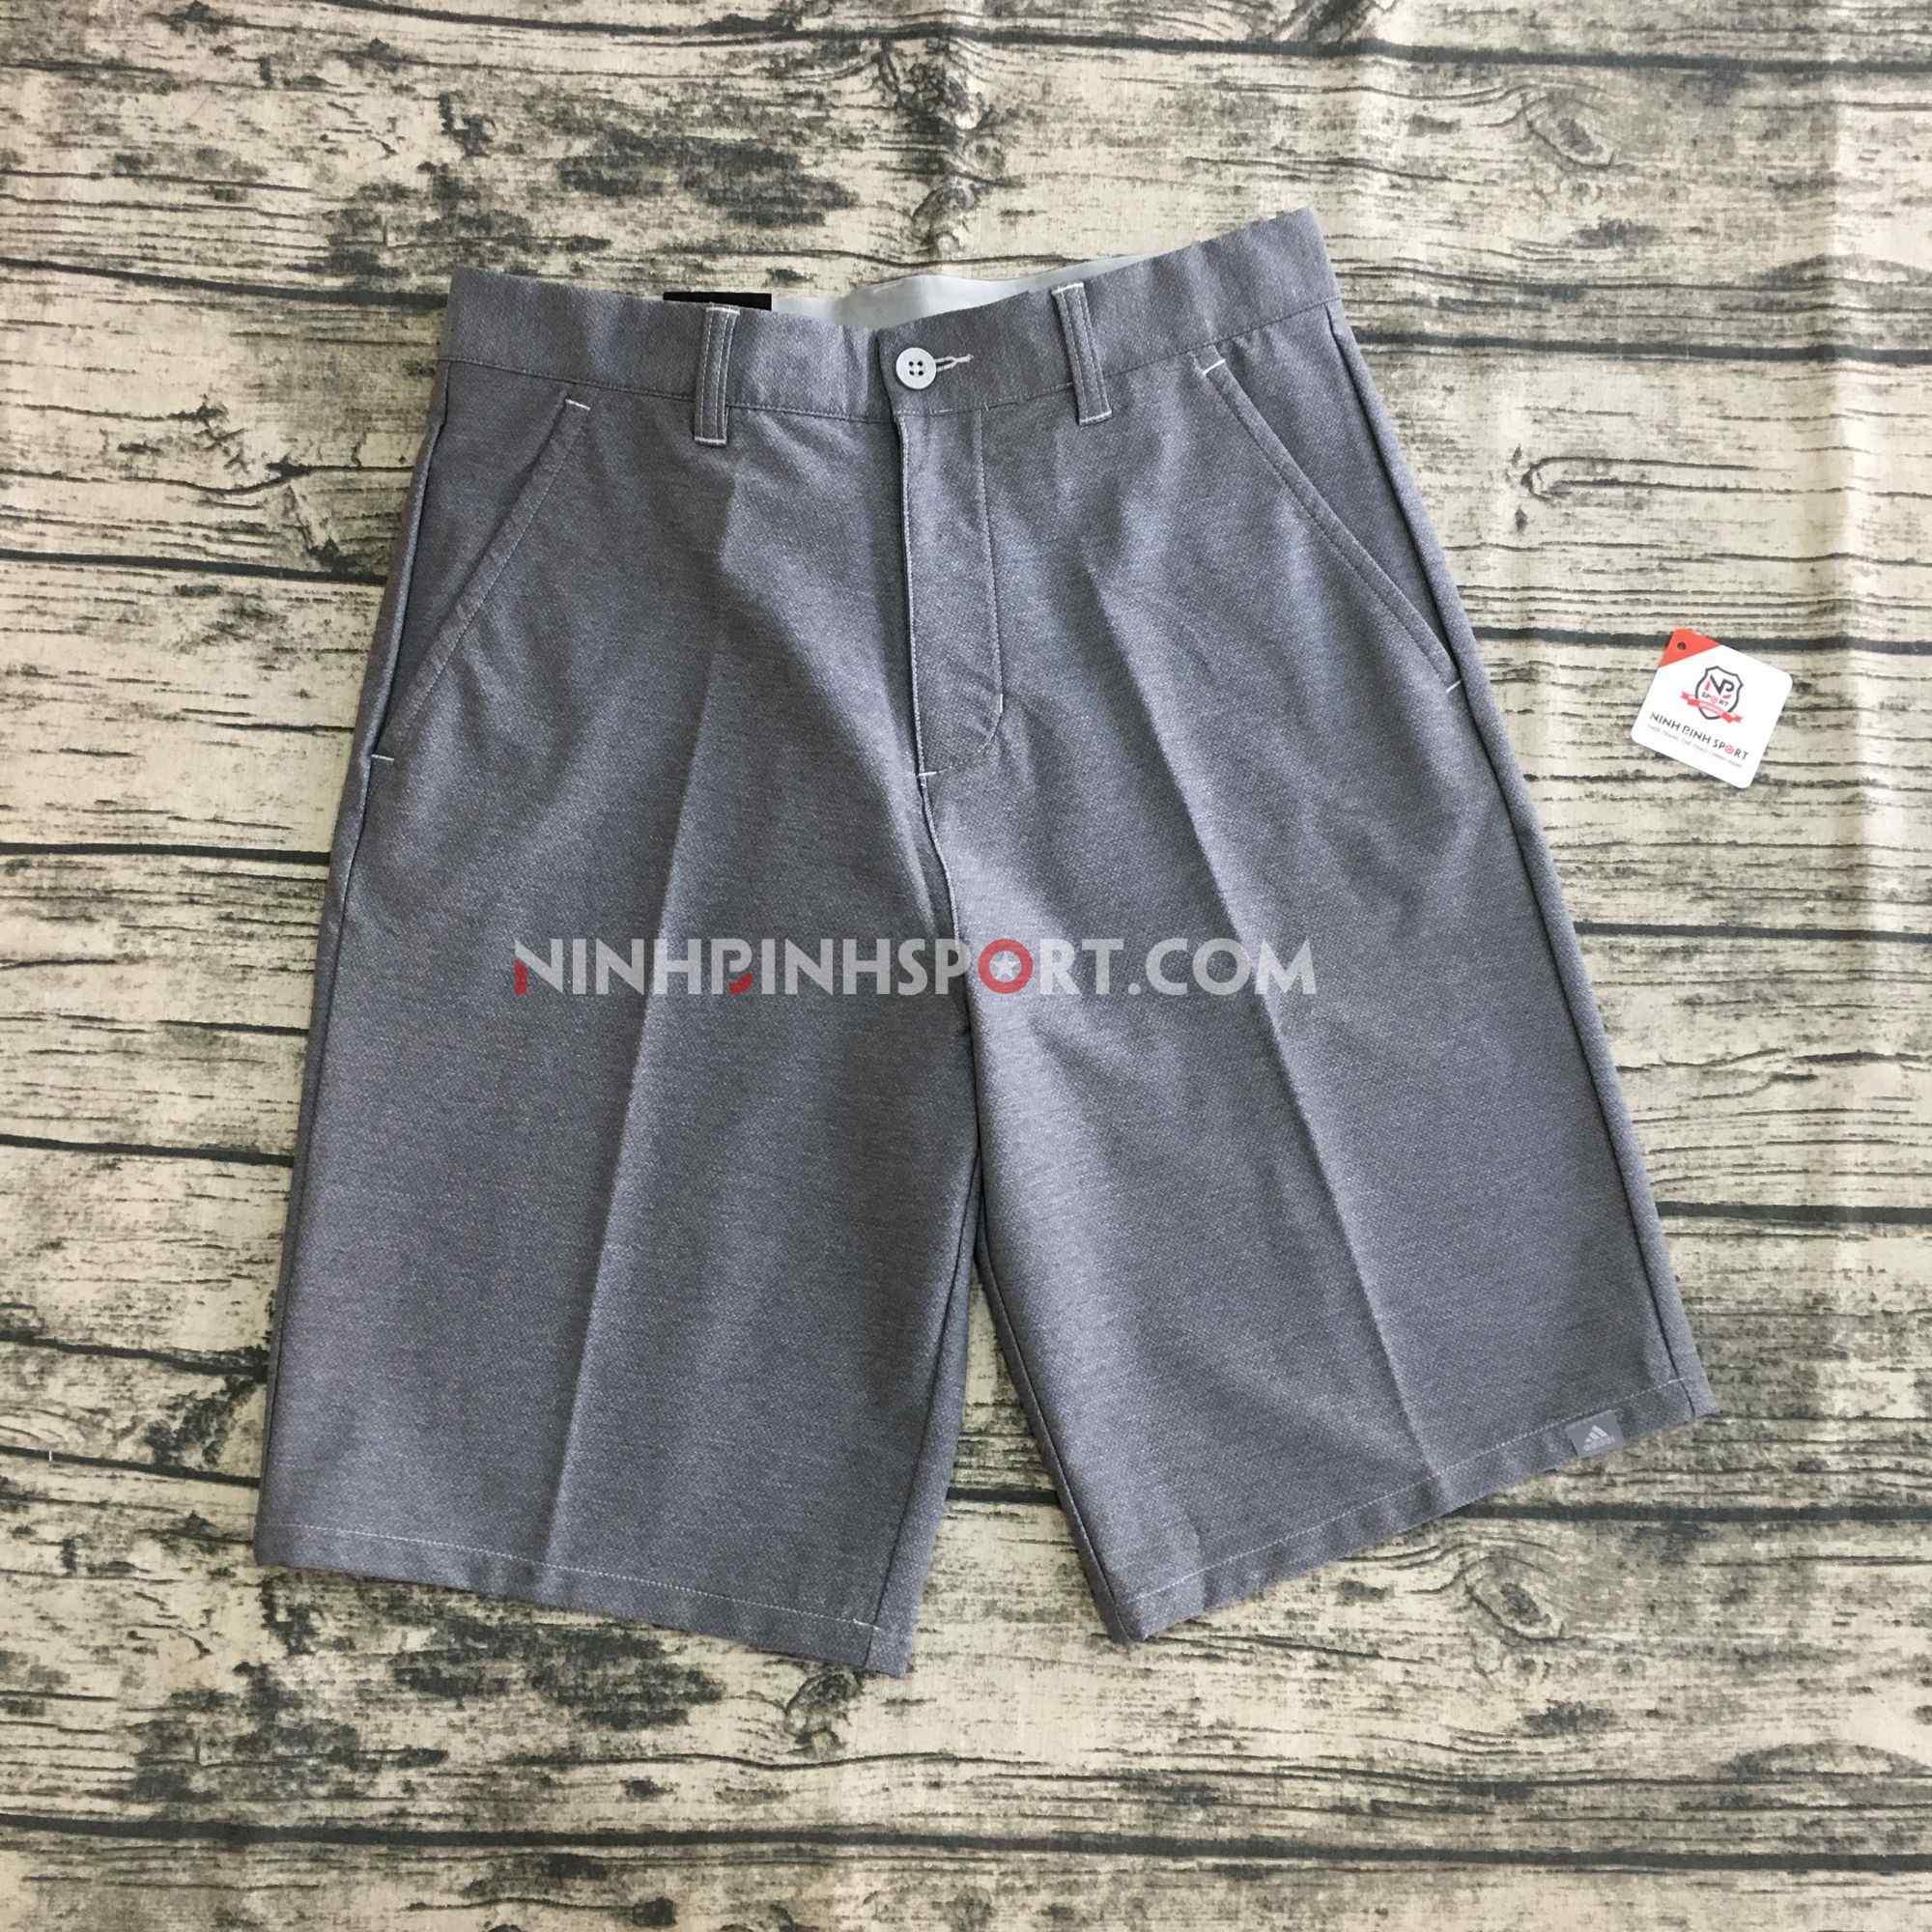 Quần Thể Thao Adidas Golf Ultimate 365 Crosshatch Short - Dark Grey CD9892